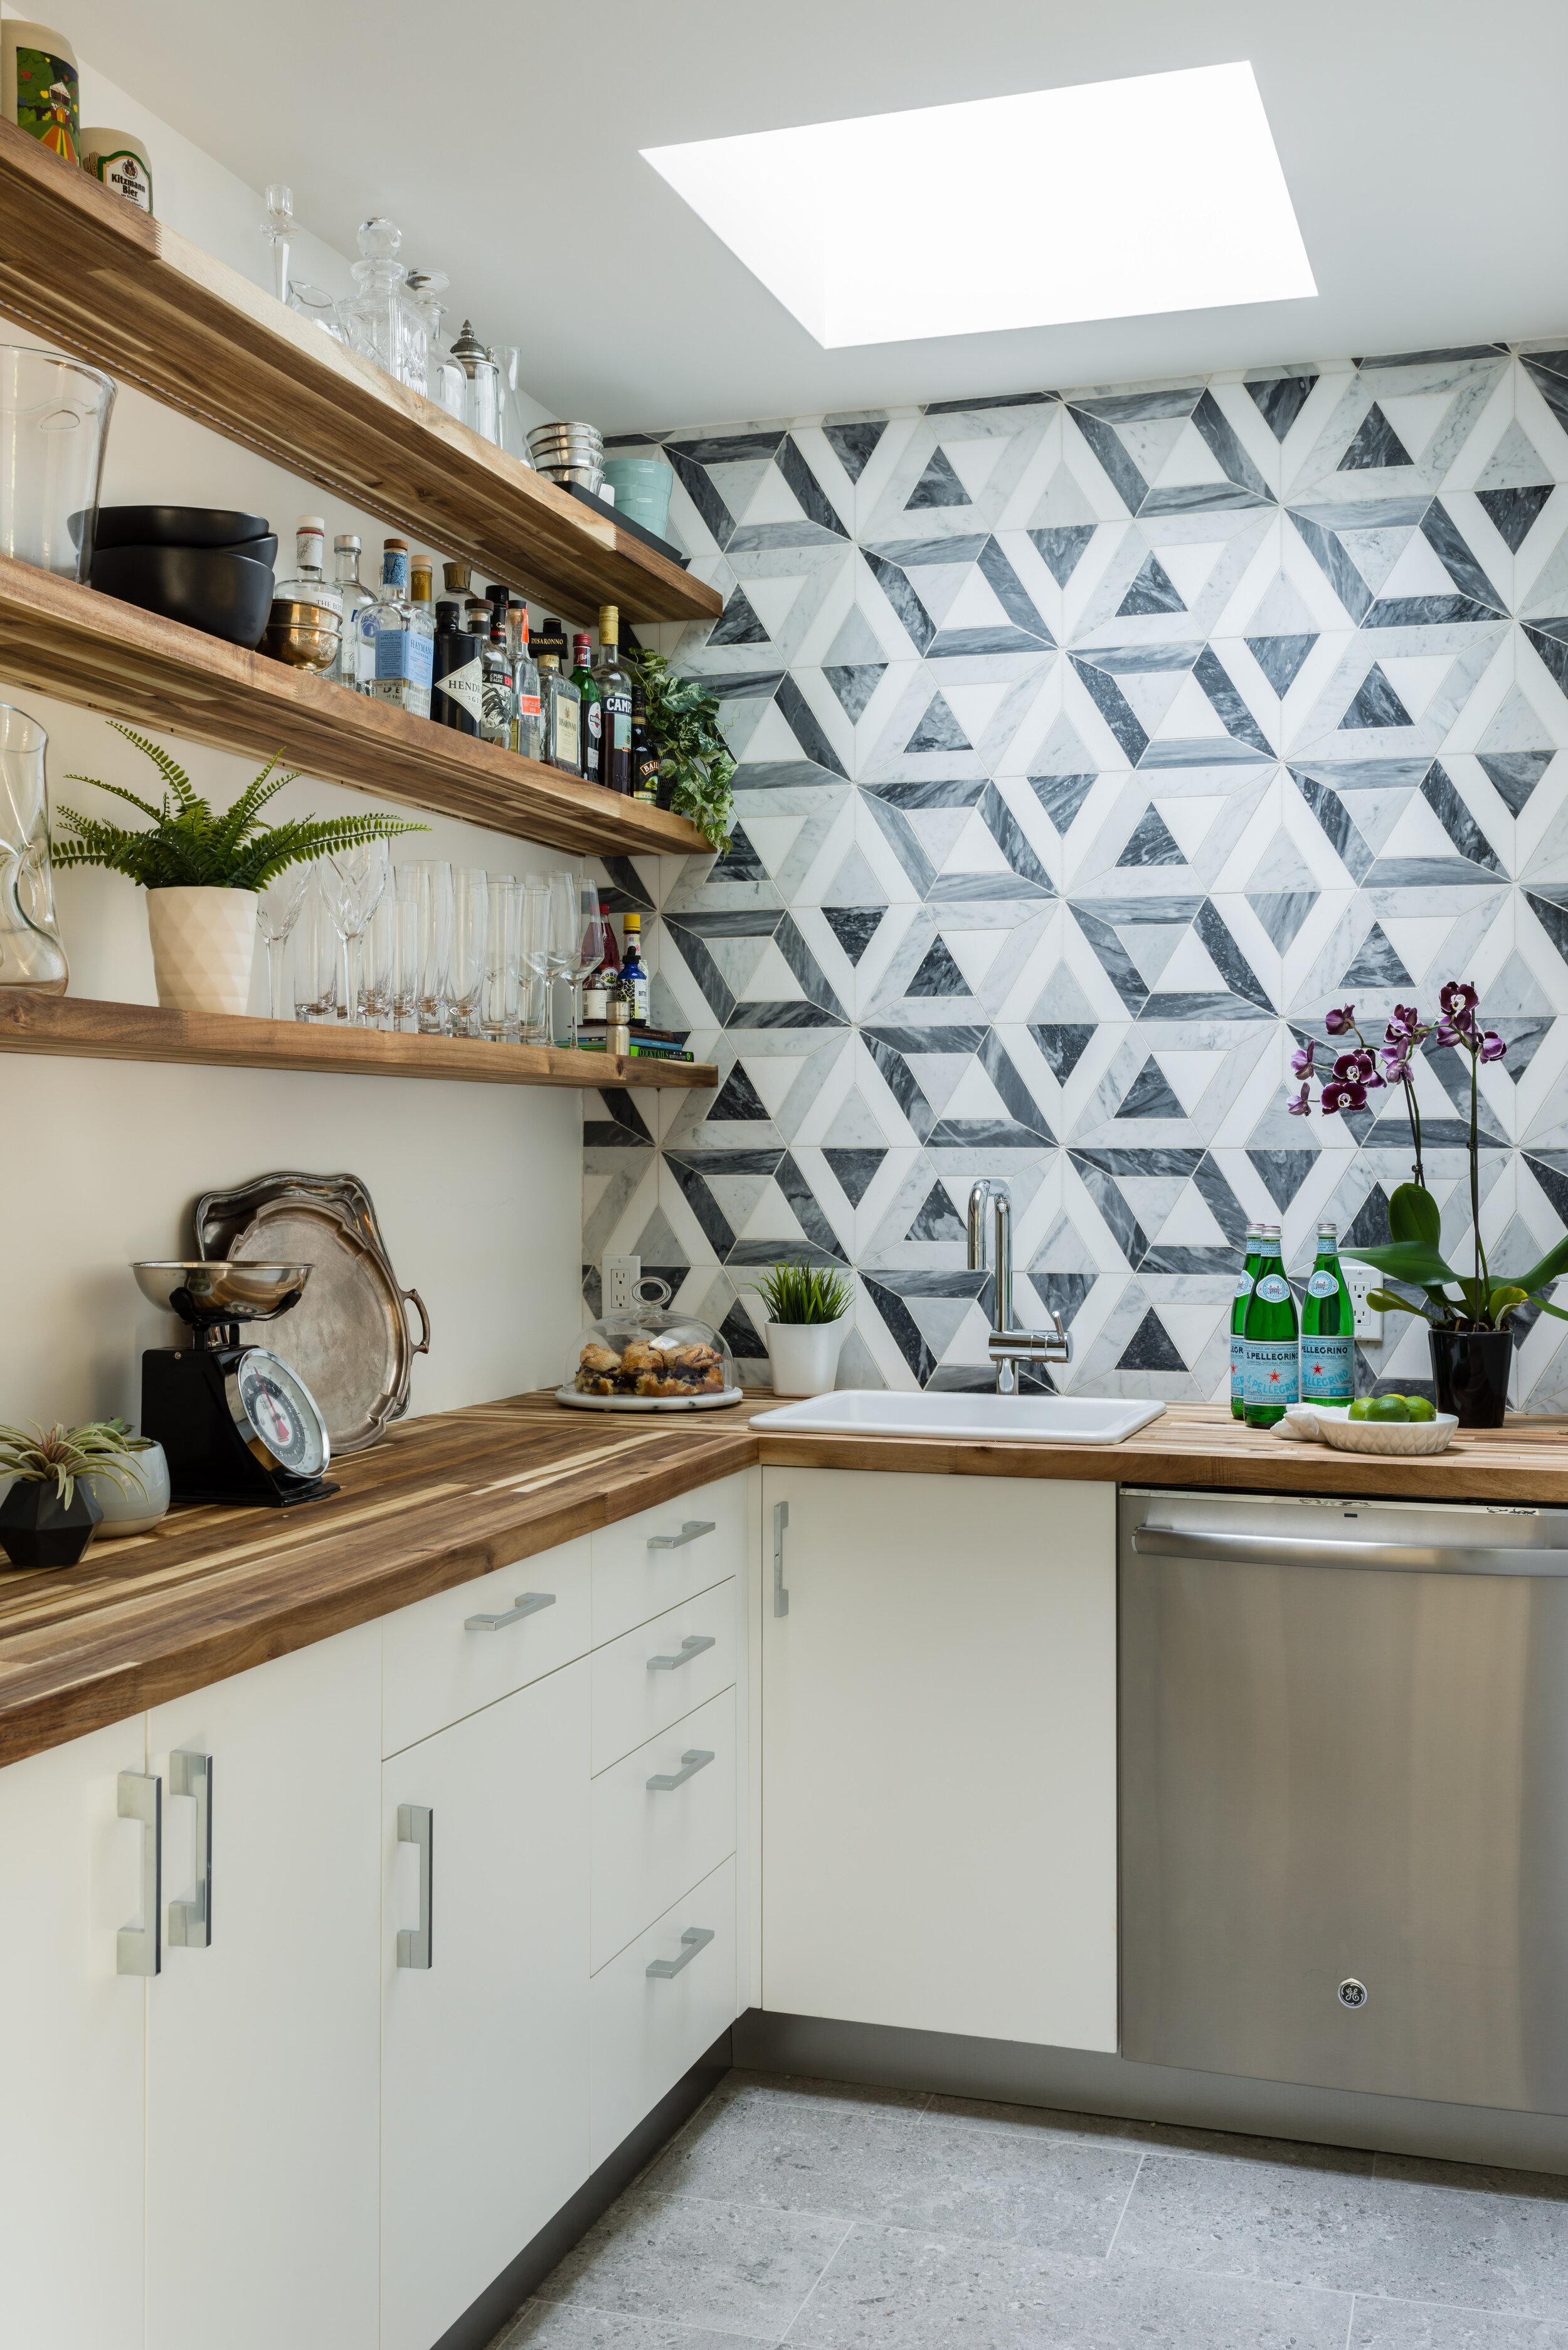 Wall + Cabinet Color,  Benjamin Moore Distant Grey ; Acacia Wood Shelves; Floor  Daltile ;  Ann Sacks Tile ; Interior Design: Anna Rostron, homeowner // Photo:  Jessica Delaney Photography